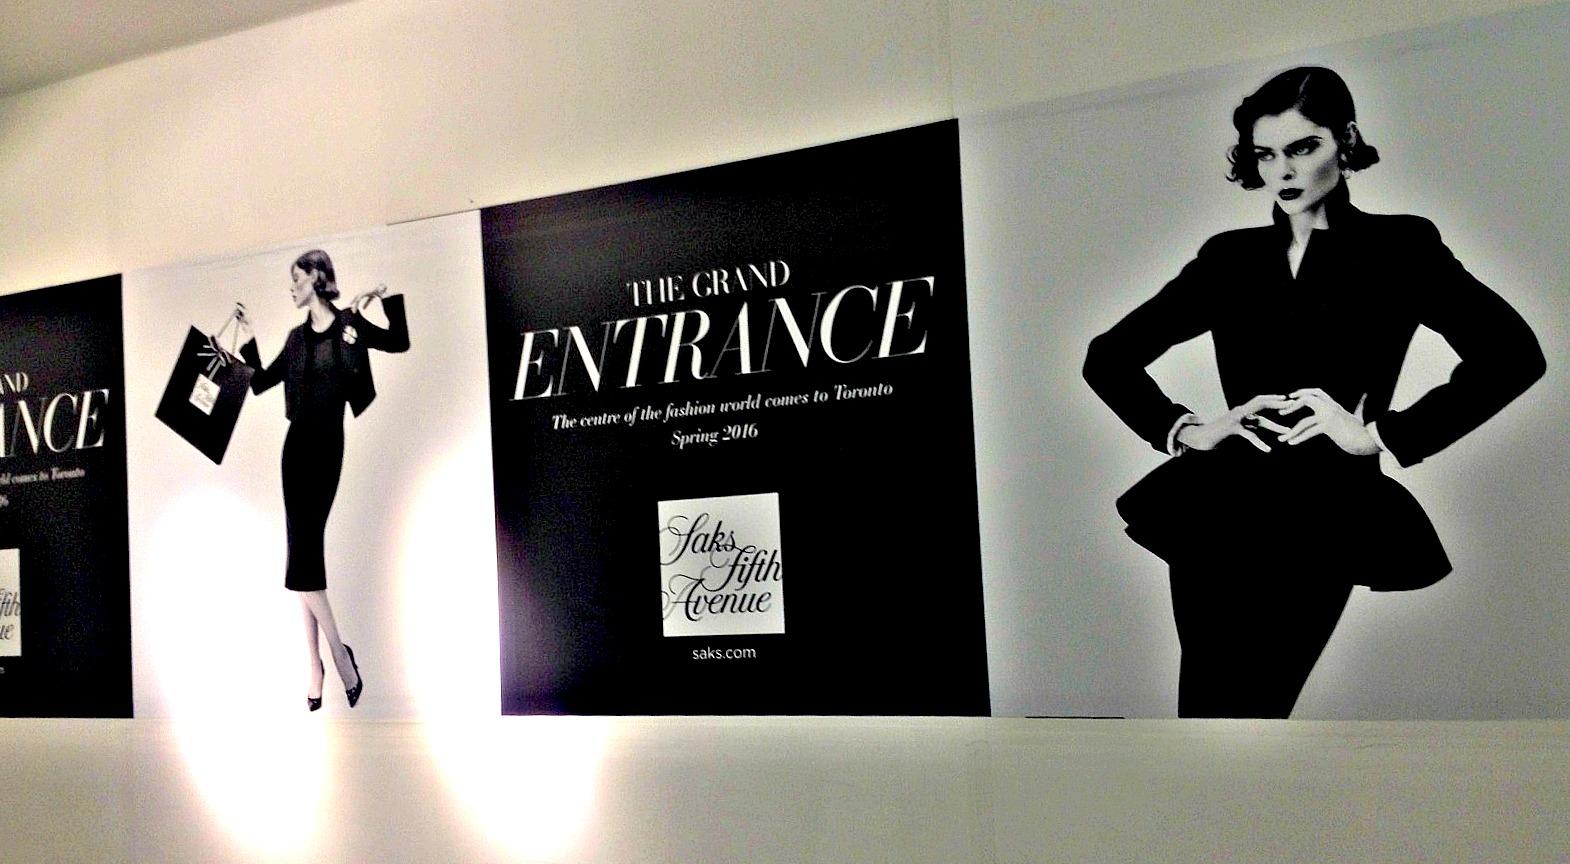 Concourse level construction hoarding features Canadian supermodel Coco Rocha. Photo: Craig Patterson